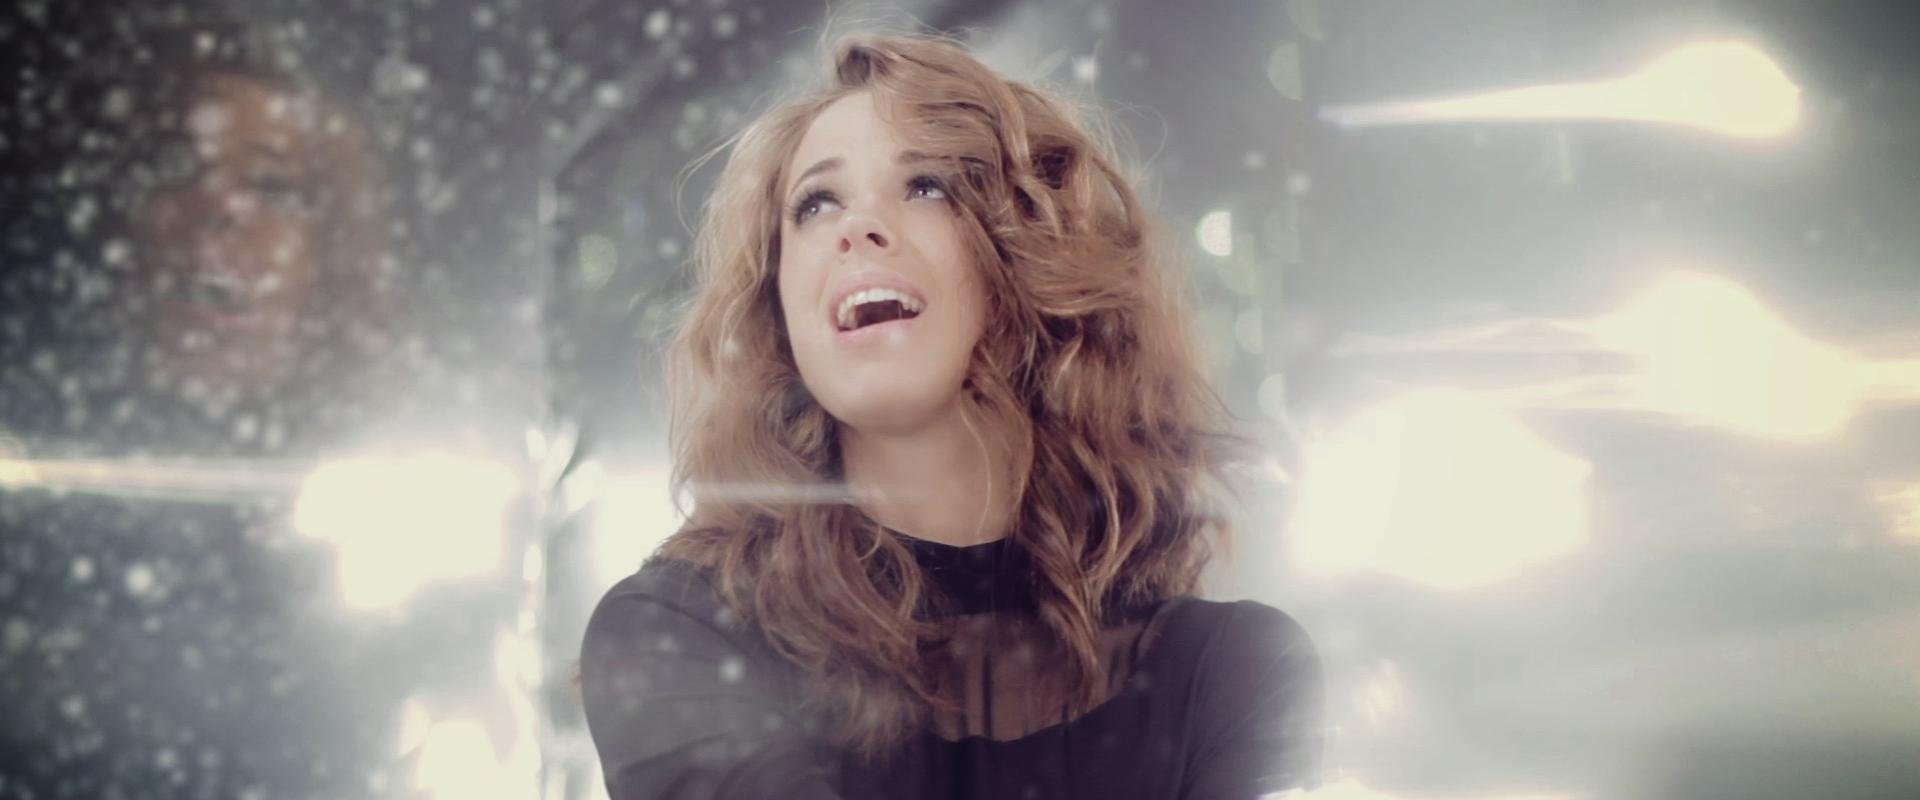 Andrea Berg Oops mamatschi (videoclip) - andrea berg - vevo